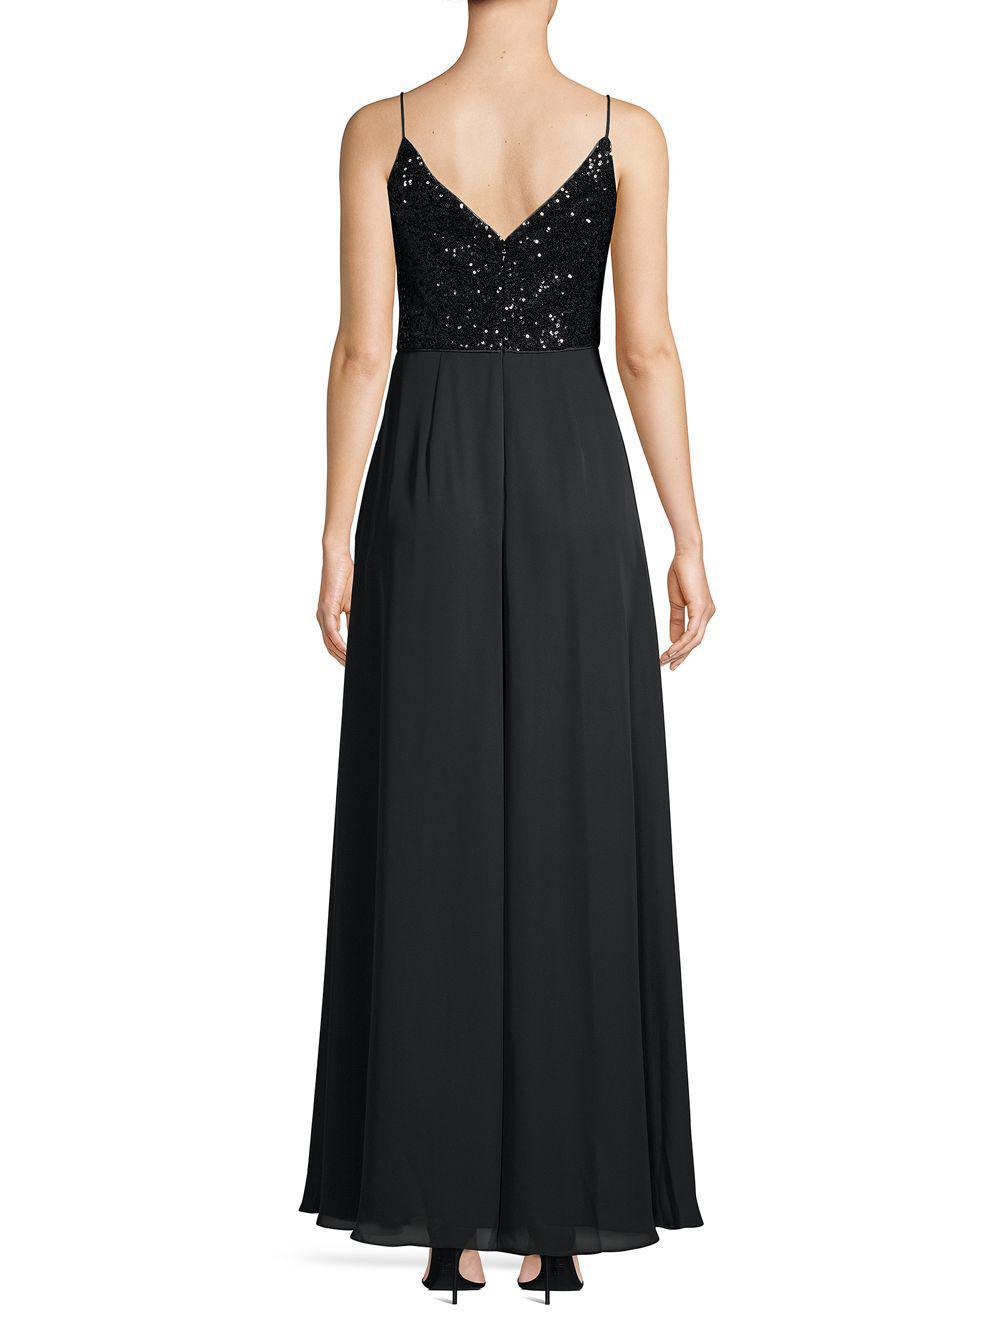 fe88543b5fae Calvin Klein - Black Sequin & Chiffon Ruffle Slit Gown - Lyst. View  fullscreen